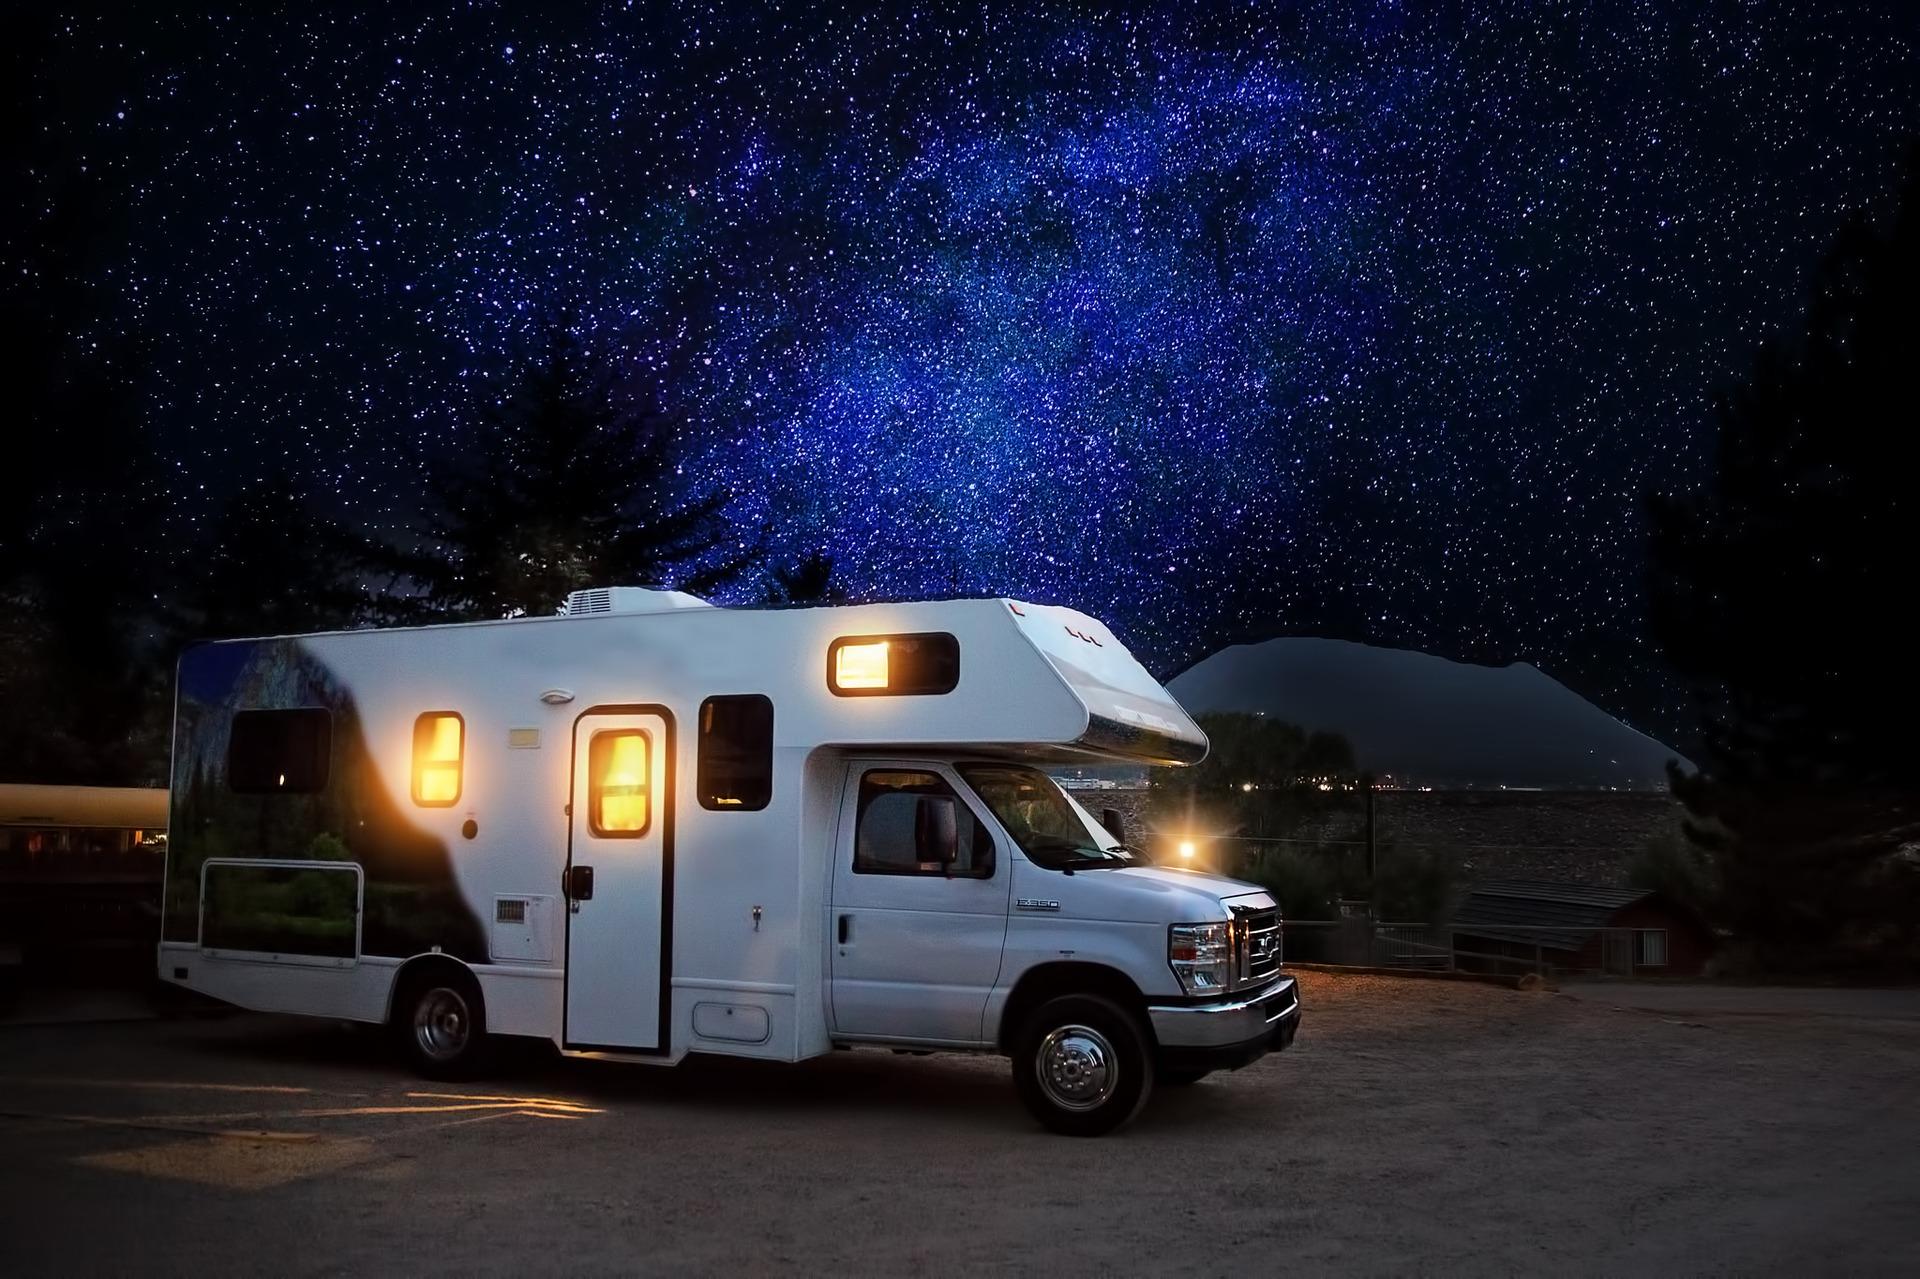 RV camper under the night stars